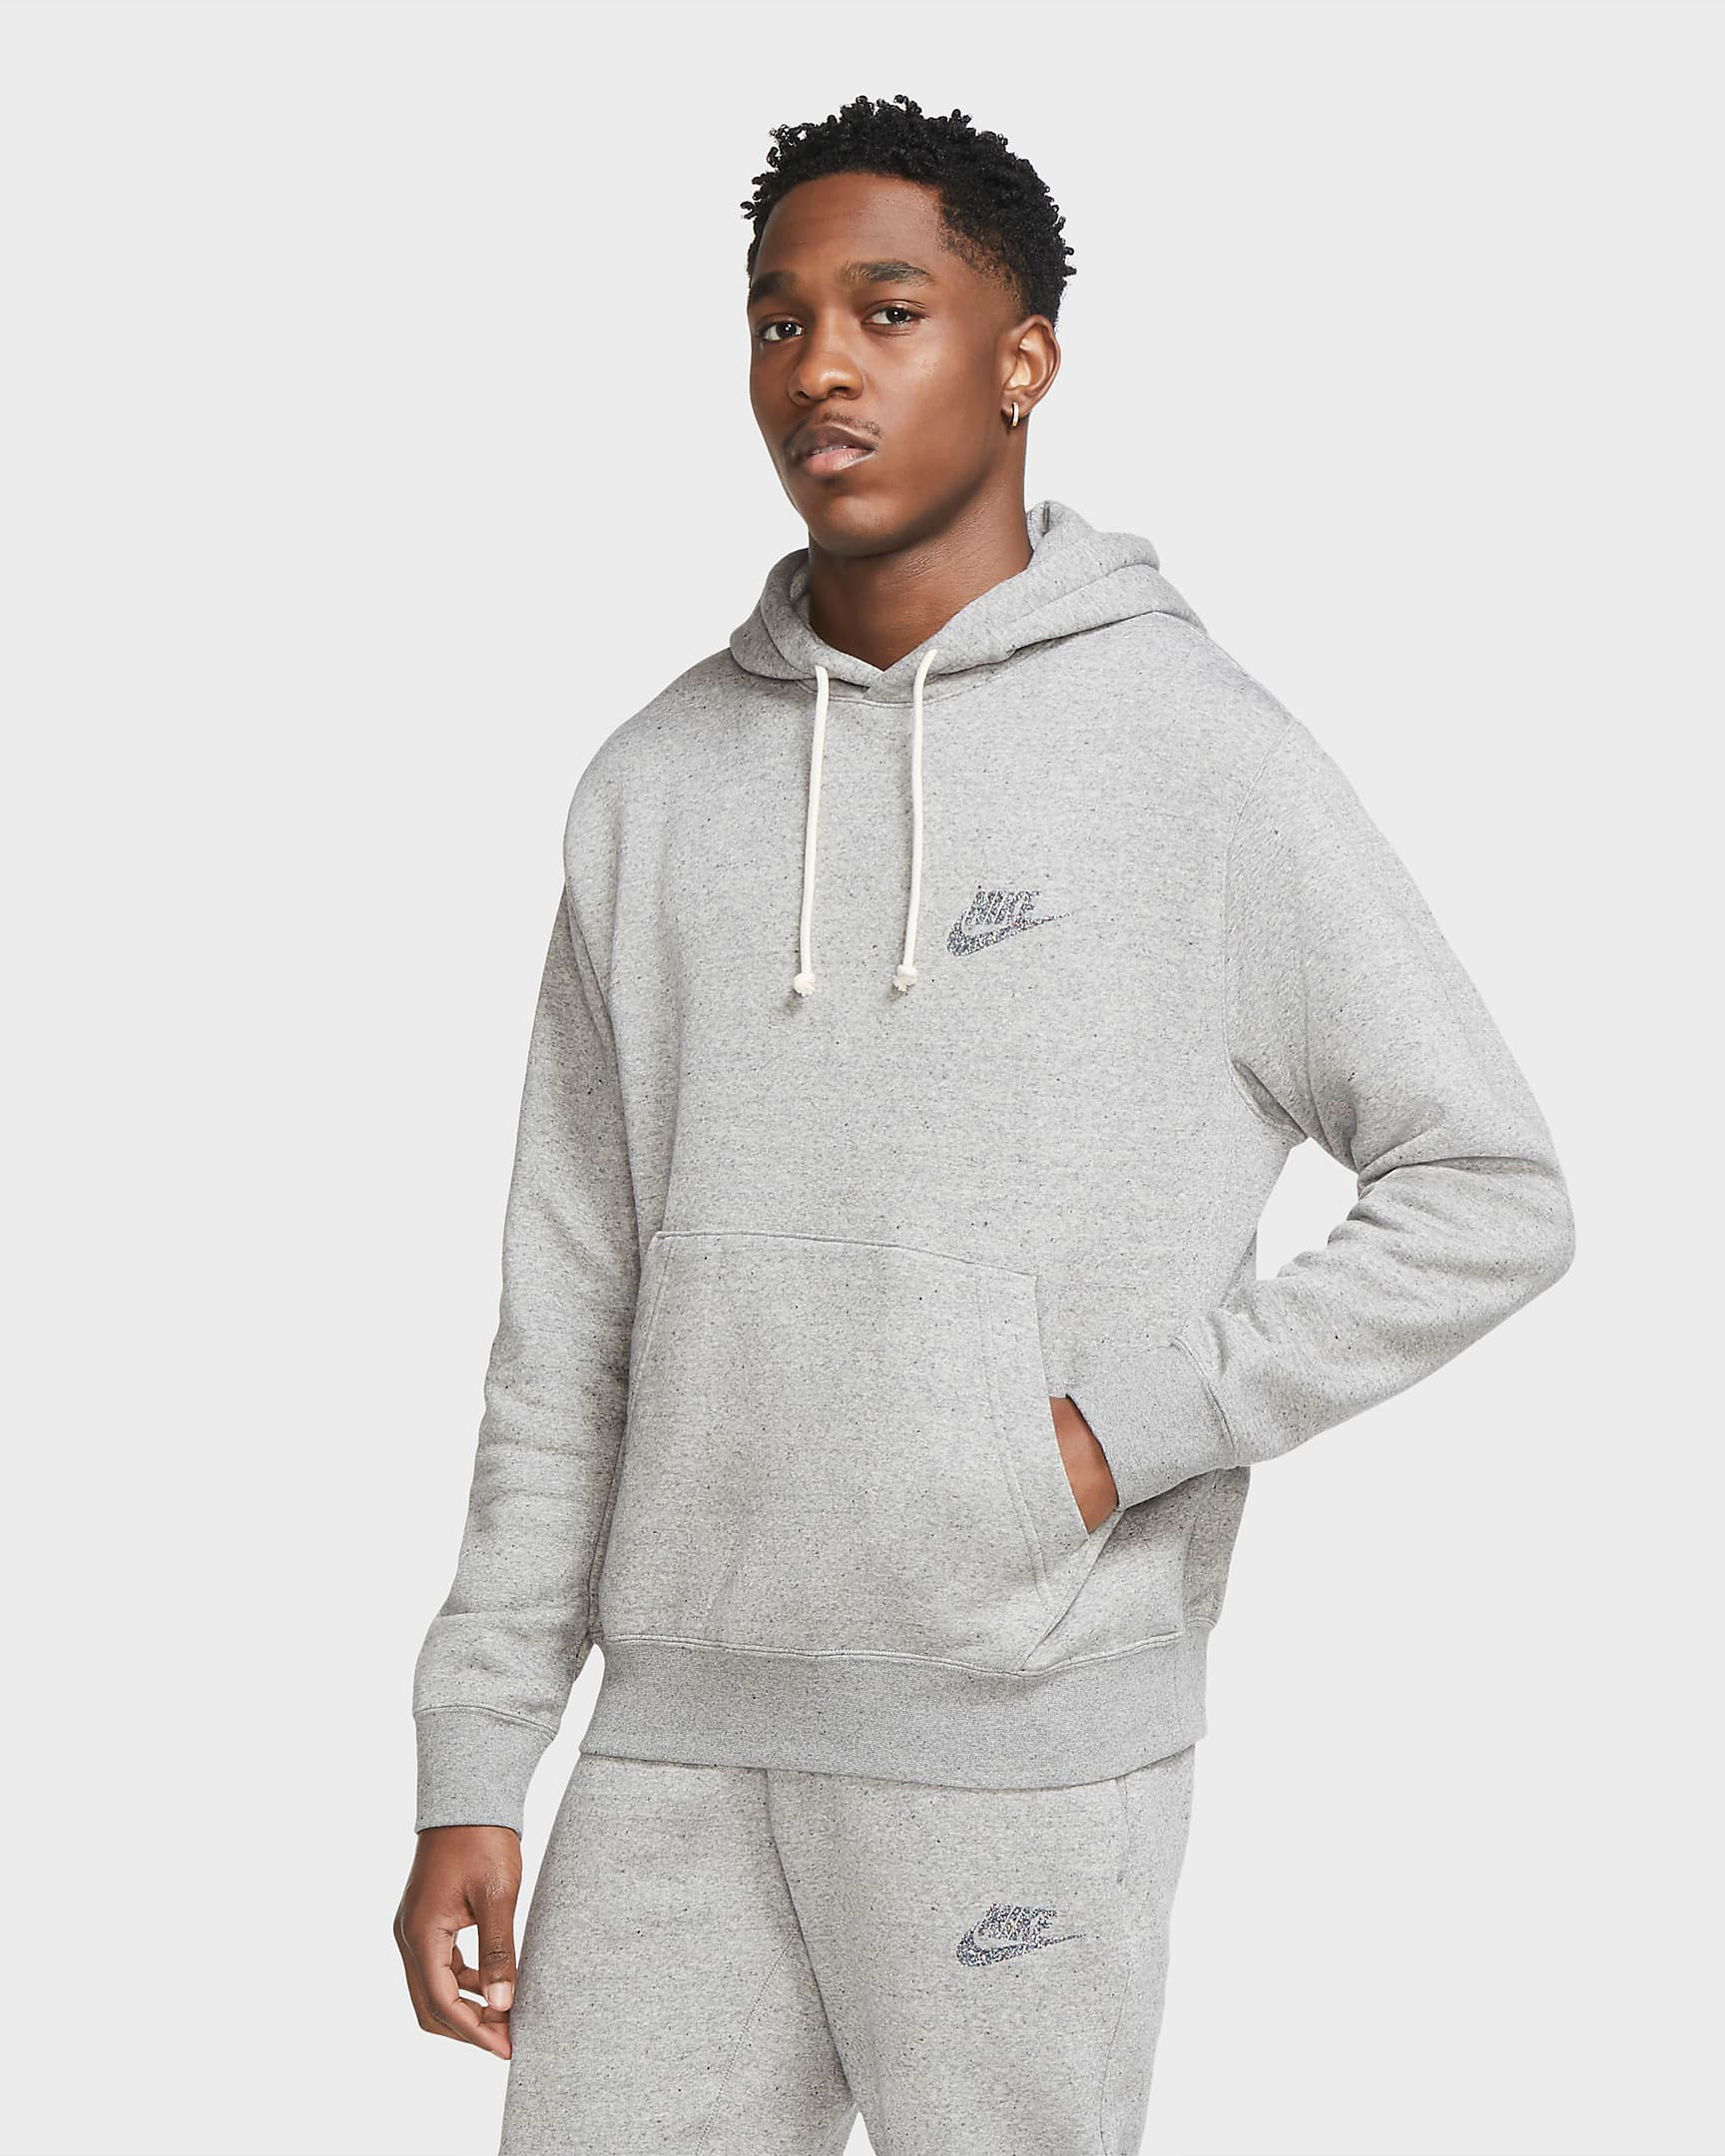 nike-vapormax-2020-hoodie-match